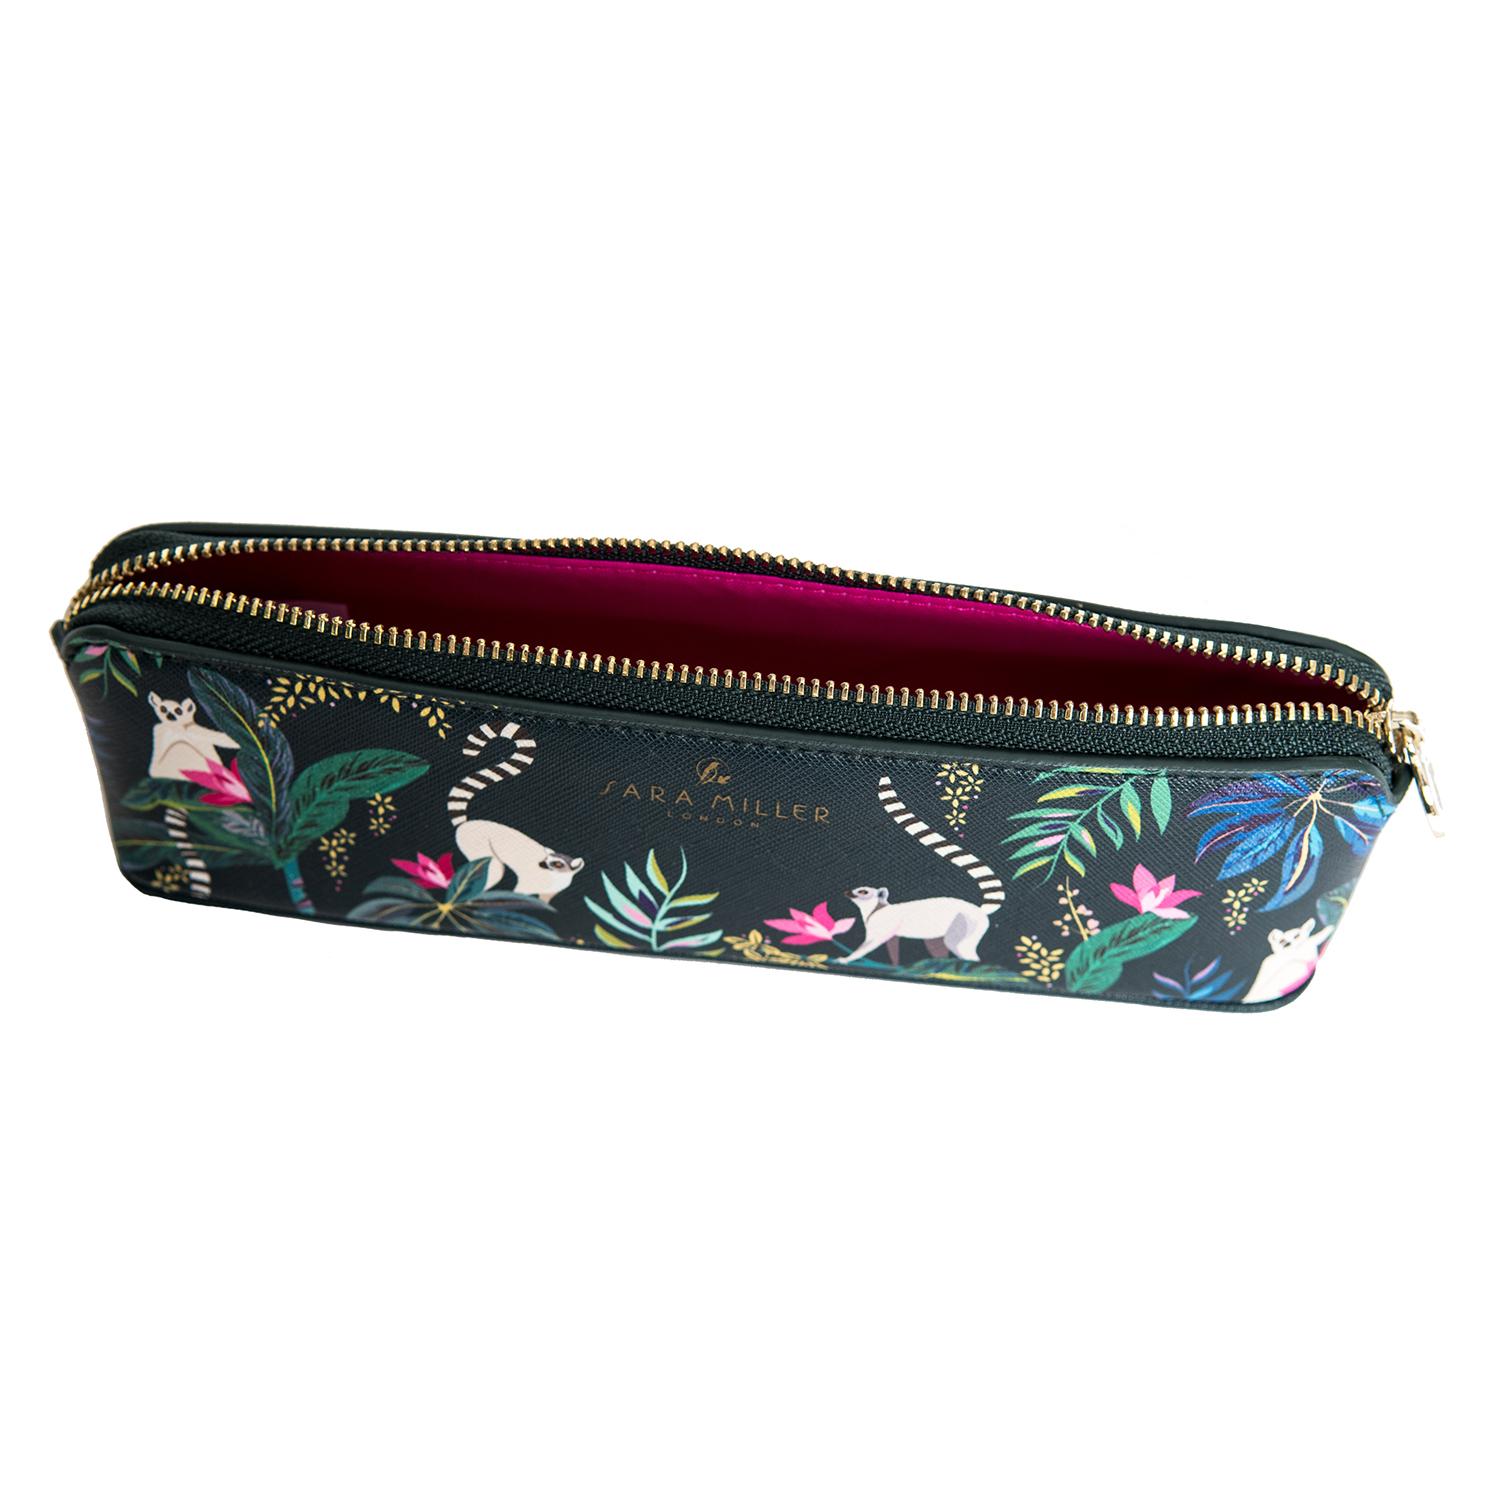 Sara Miller – Green Tahiti Lemur Design Ballpoint Pen and Matching Pencil Case